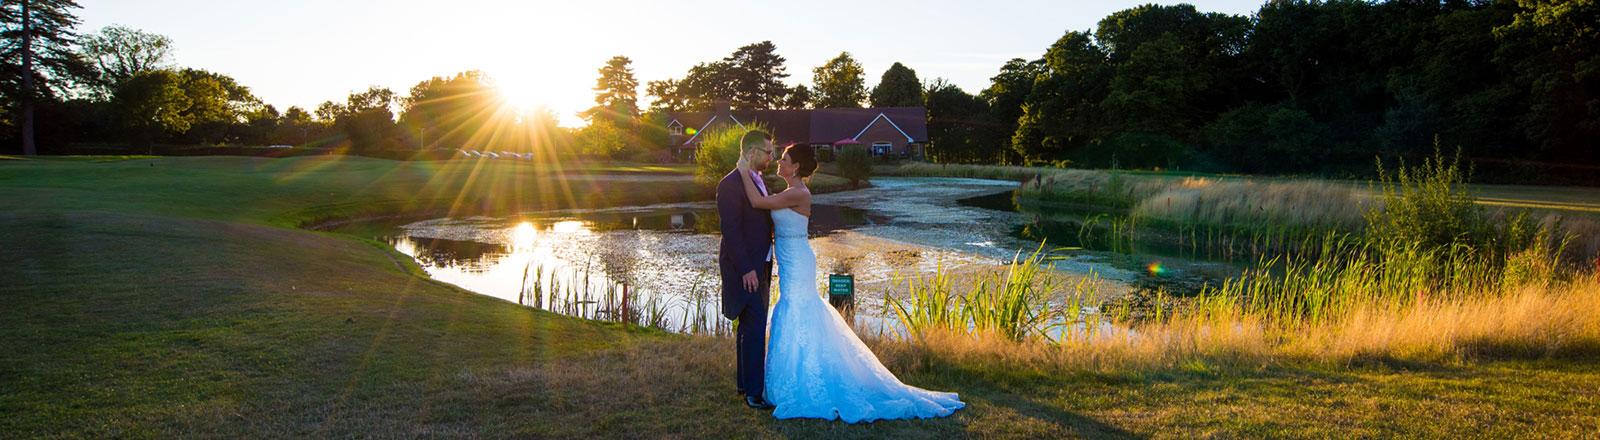 Aldwickbury Park Wedding outdoor shot at sunset